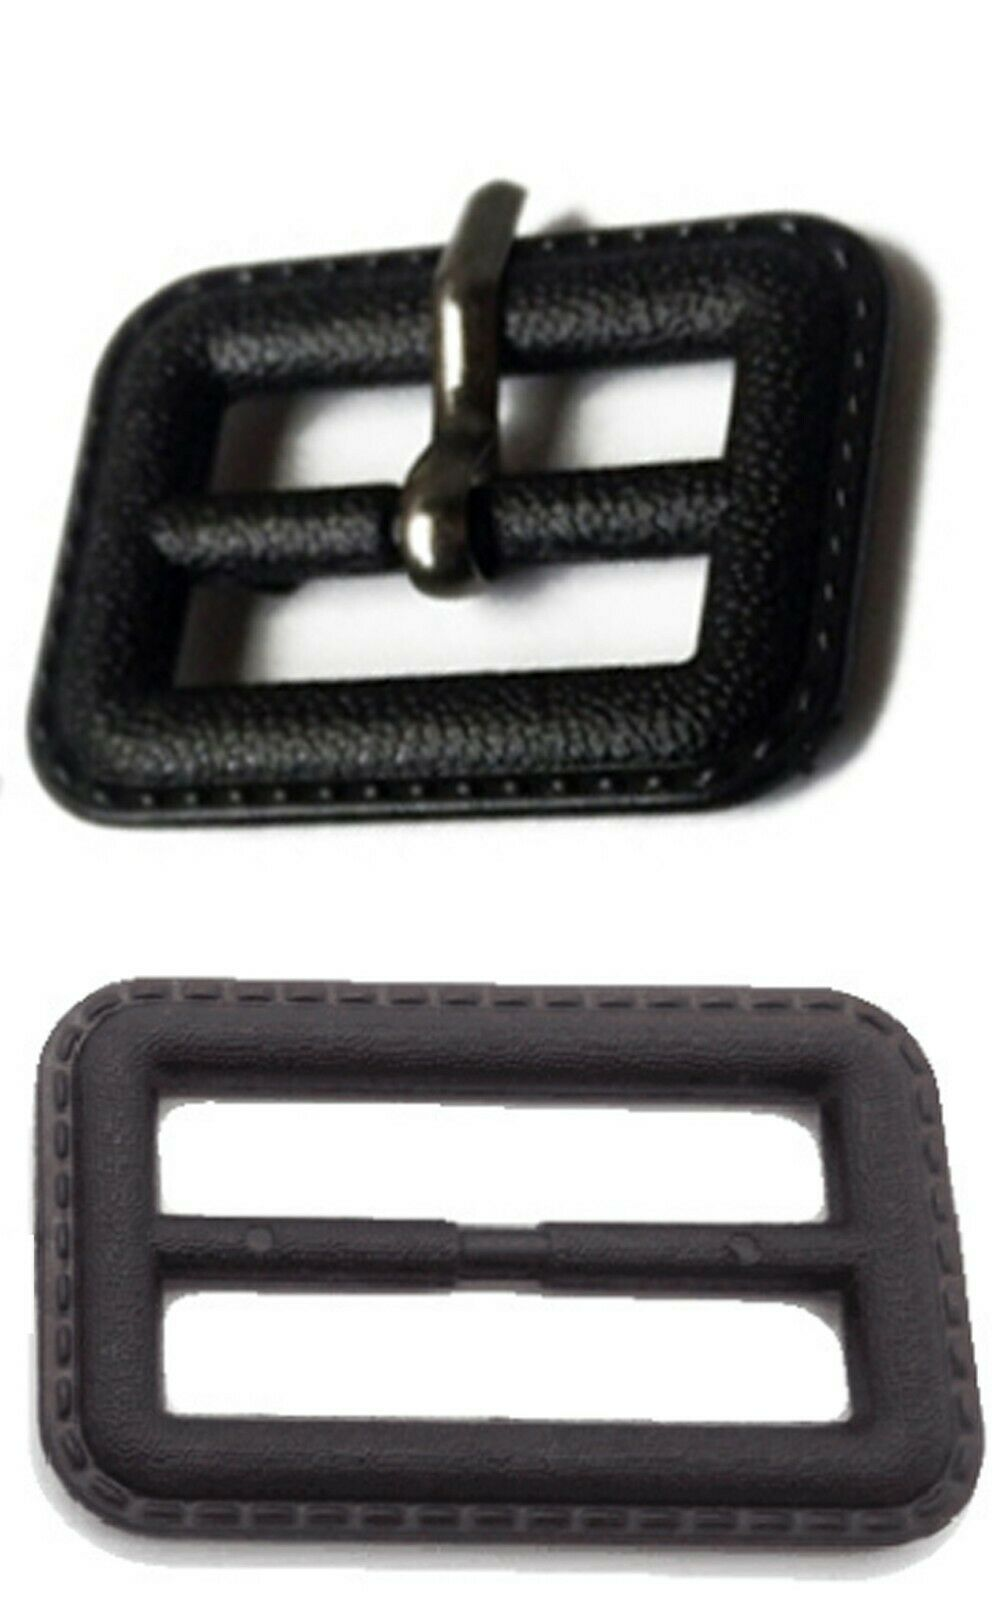 1 X Bolsa De Cinturón Para Hebillas De Imitación De Cuero Zapatos Abrigo Chaqueta Tamaño: 6.5cm #2